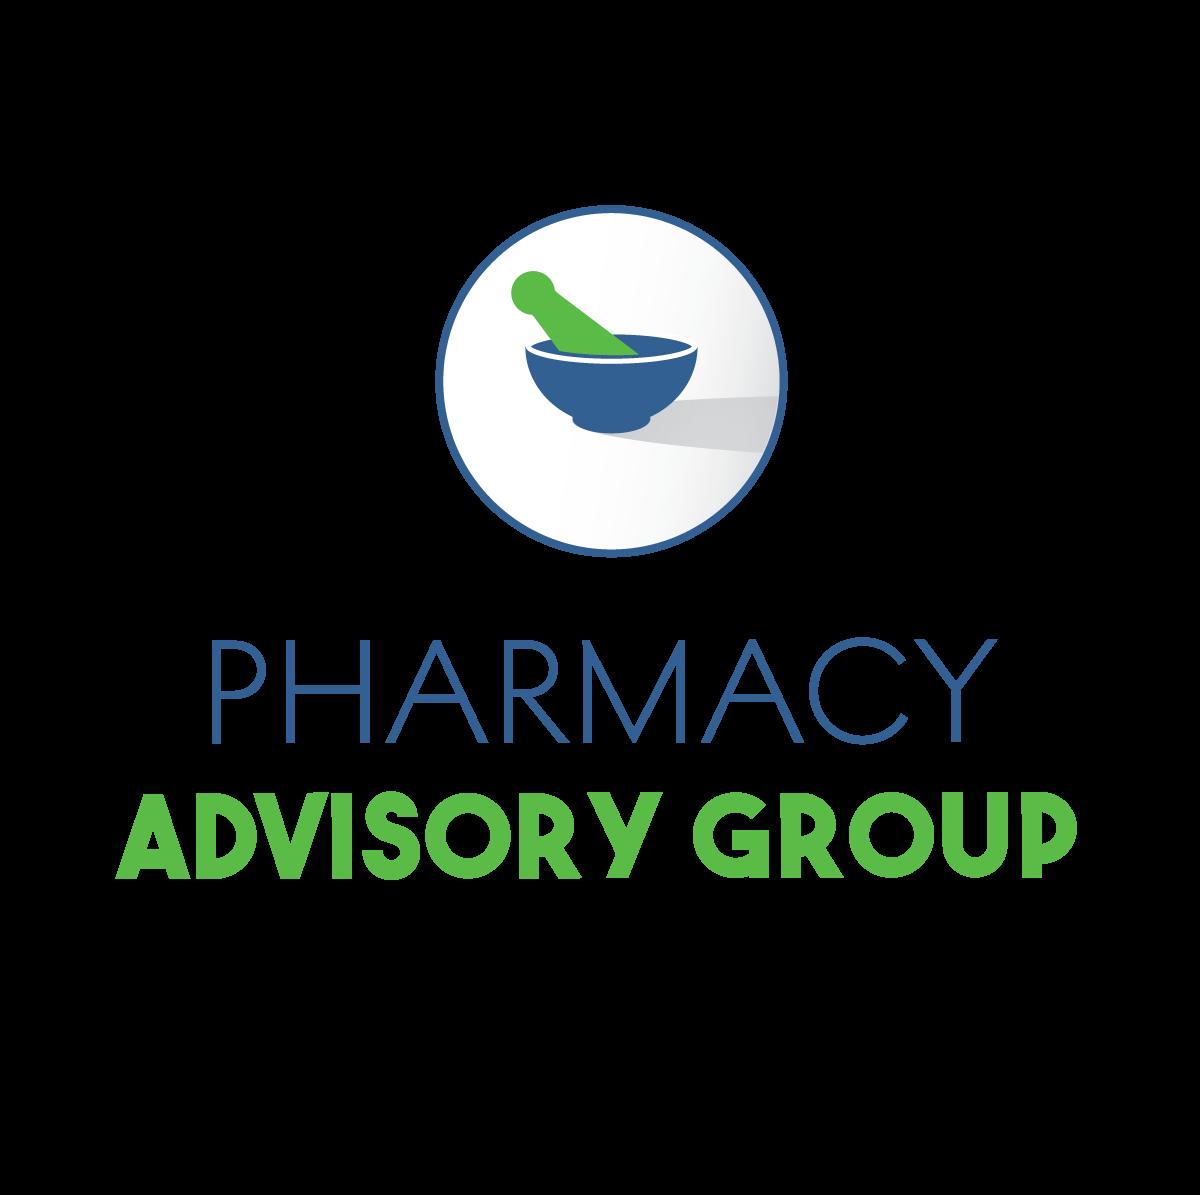 Pharmacy Advisory Group